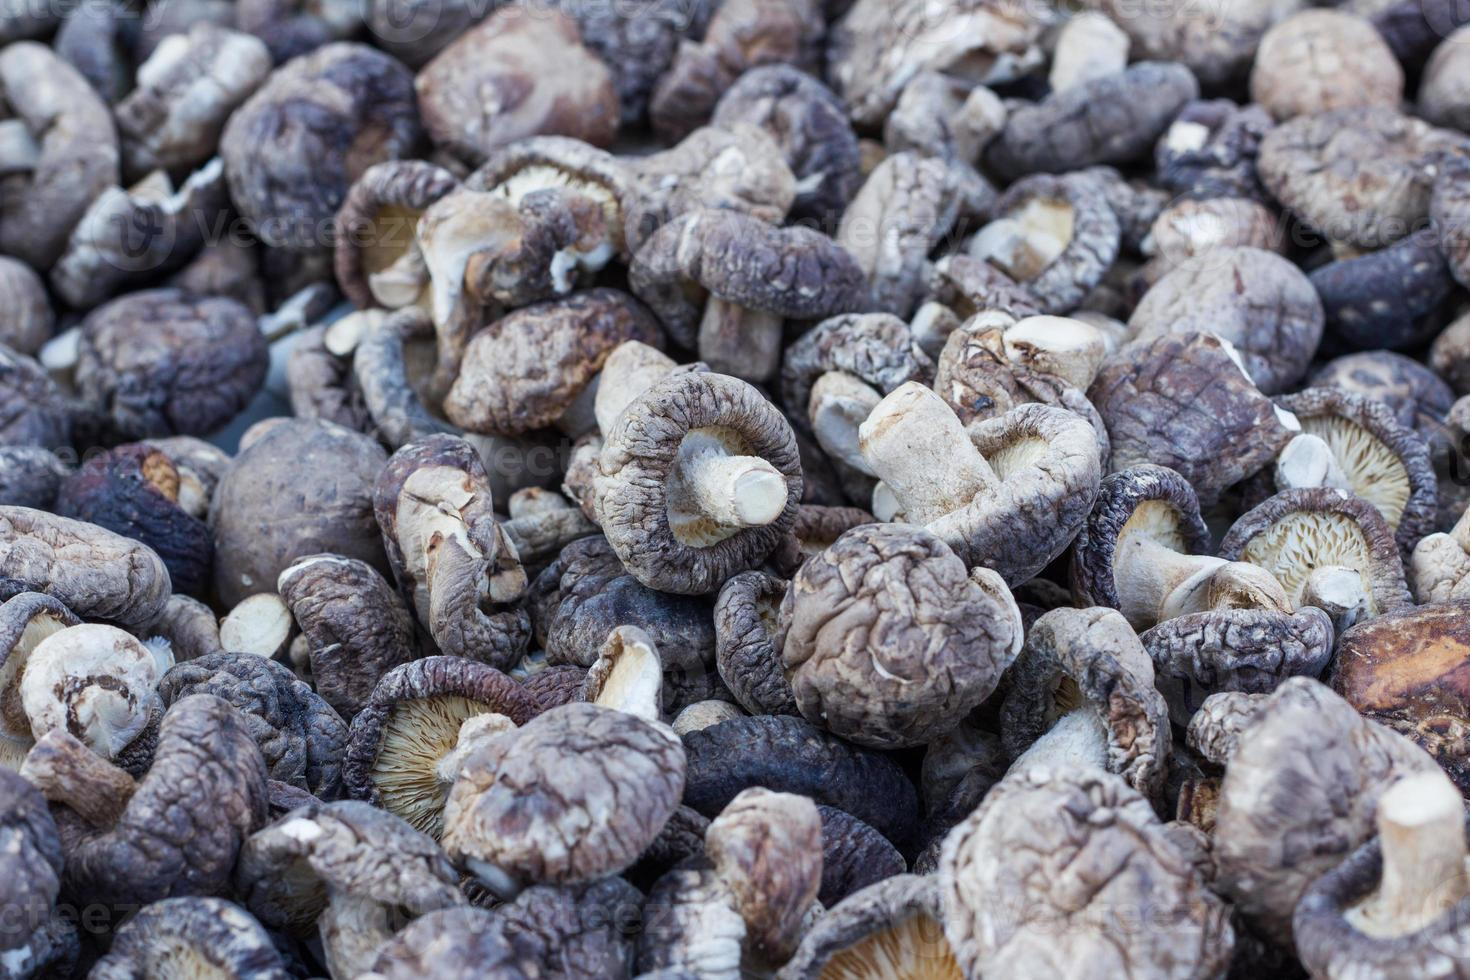 hongos shiitake secos foto